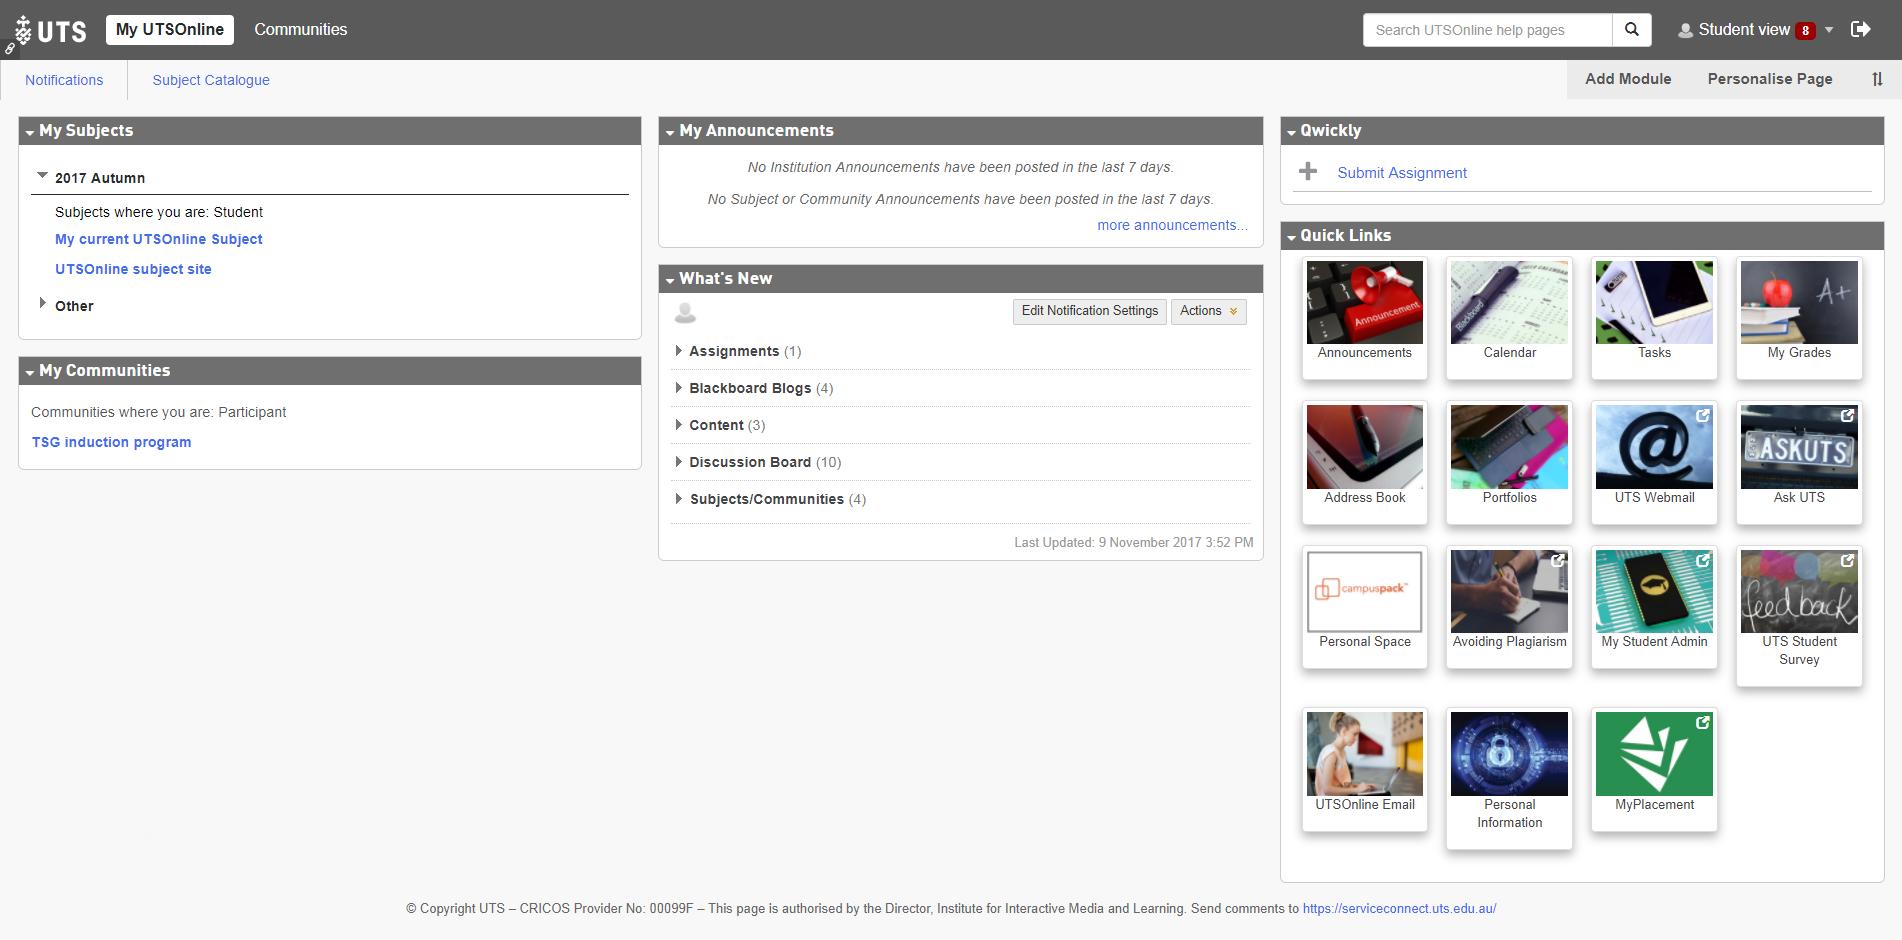 The My UTSOnline module page